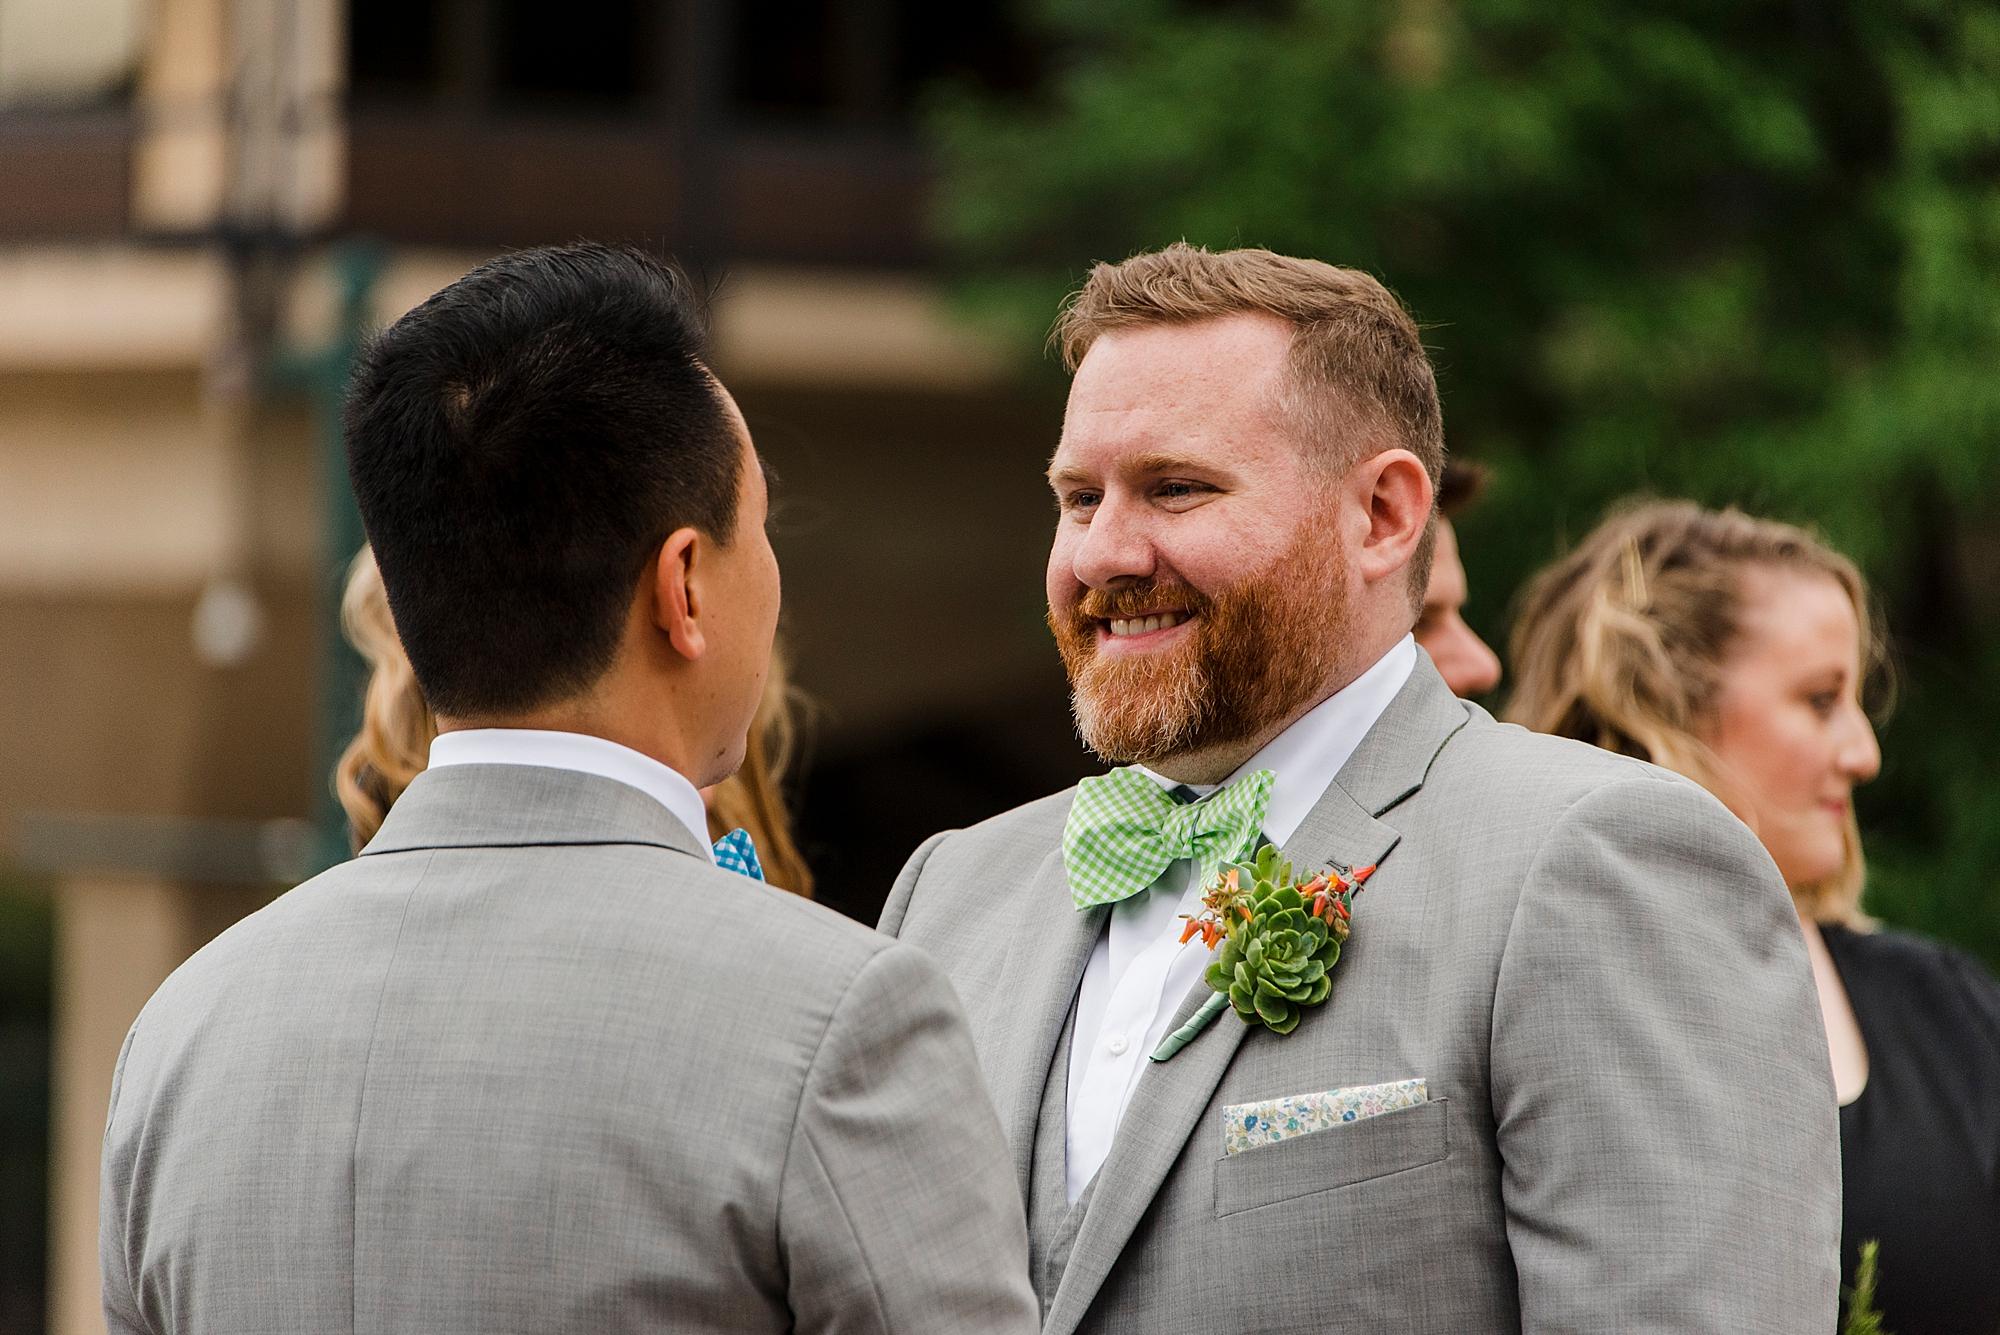 Dan_and_Byron_Love_by_Joe_Mac_Philadelphia_Wedding_LGBTQ_Photography_Gay_Independence_visitor_Center_93.JPG